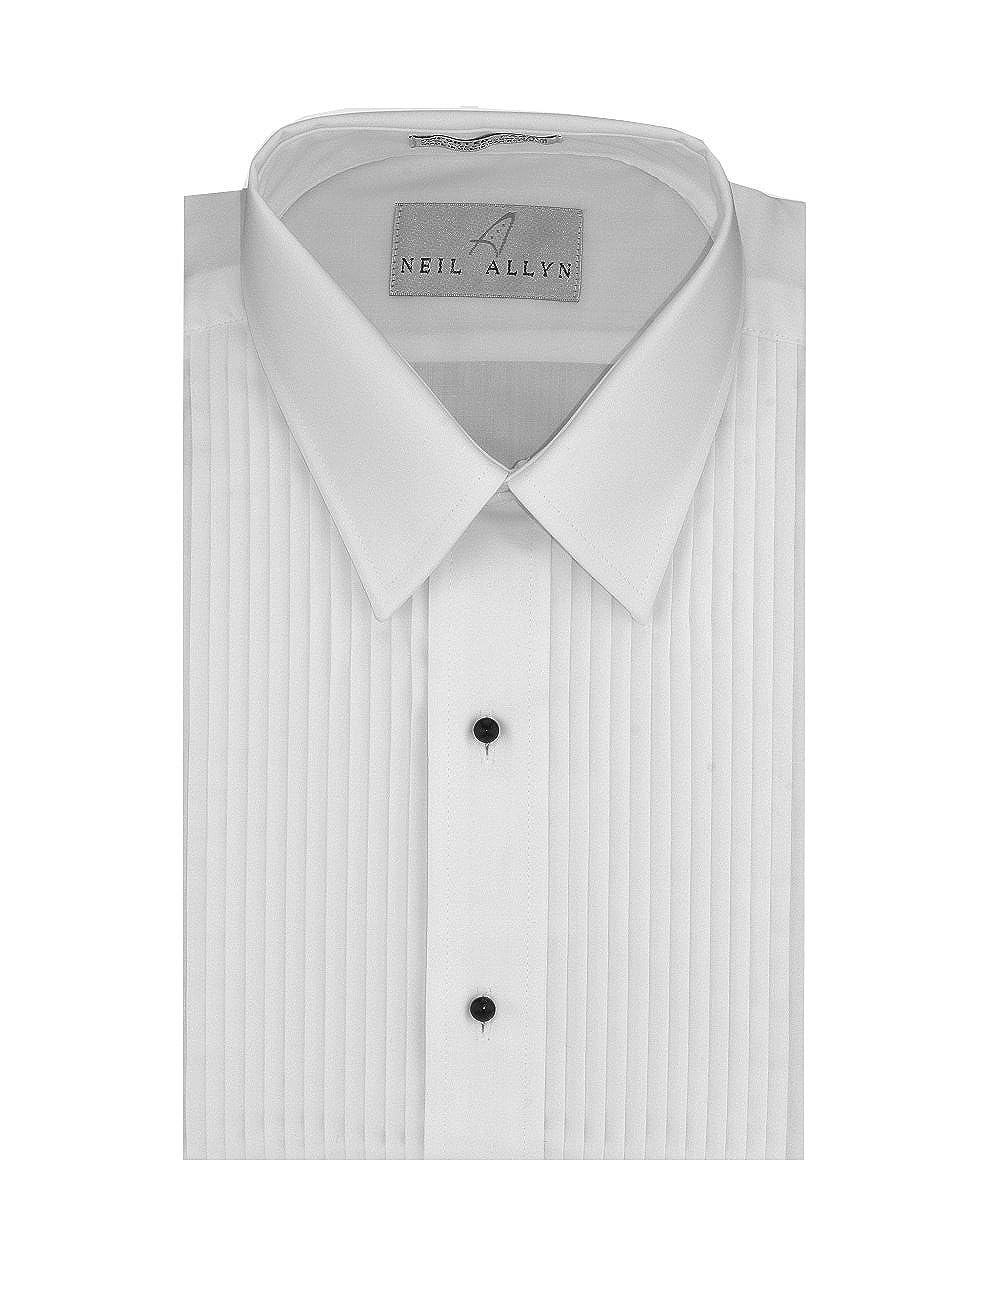 Neil Allyn Men's SLIM FIT Lay-Down Collar 1/4 Pleats Tuxedo Shirt